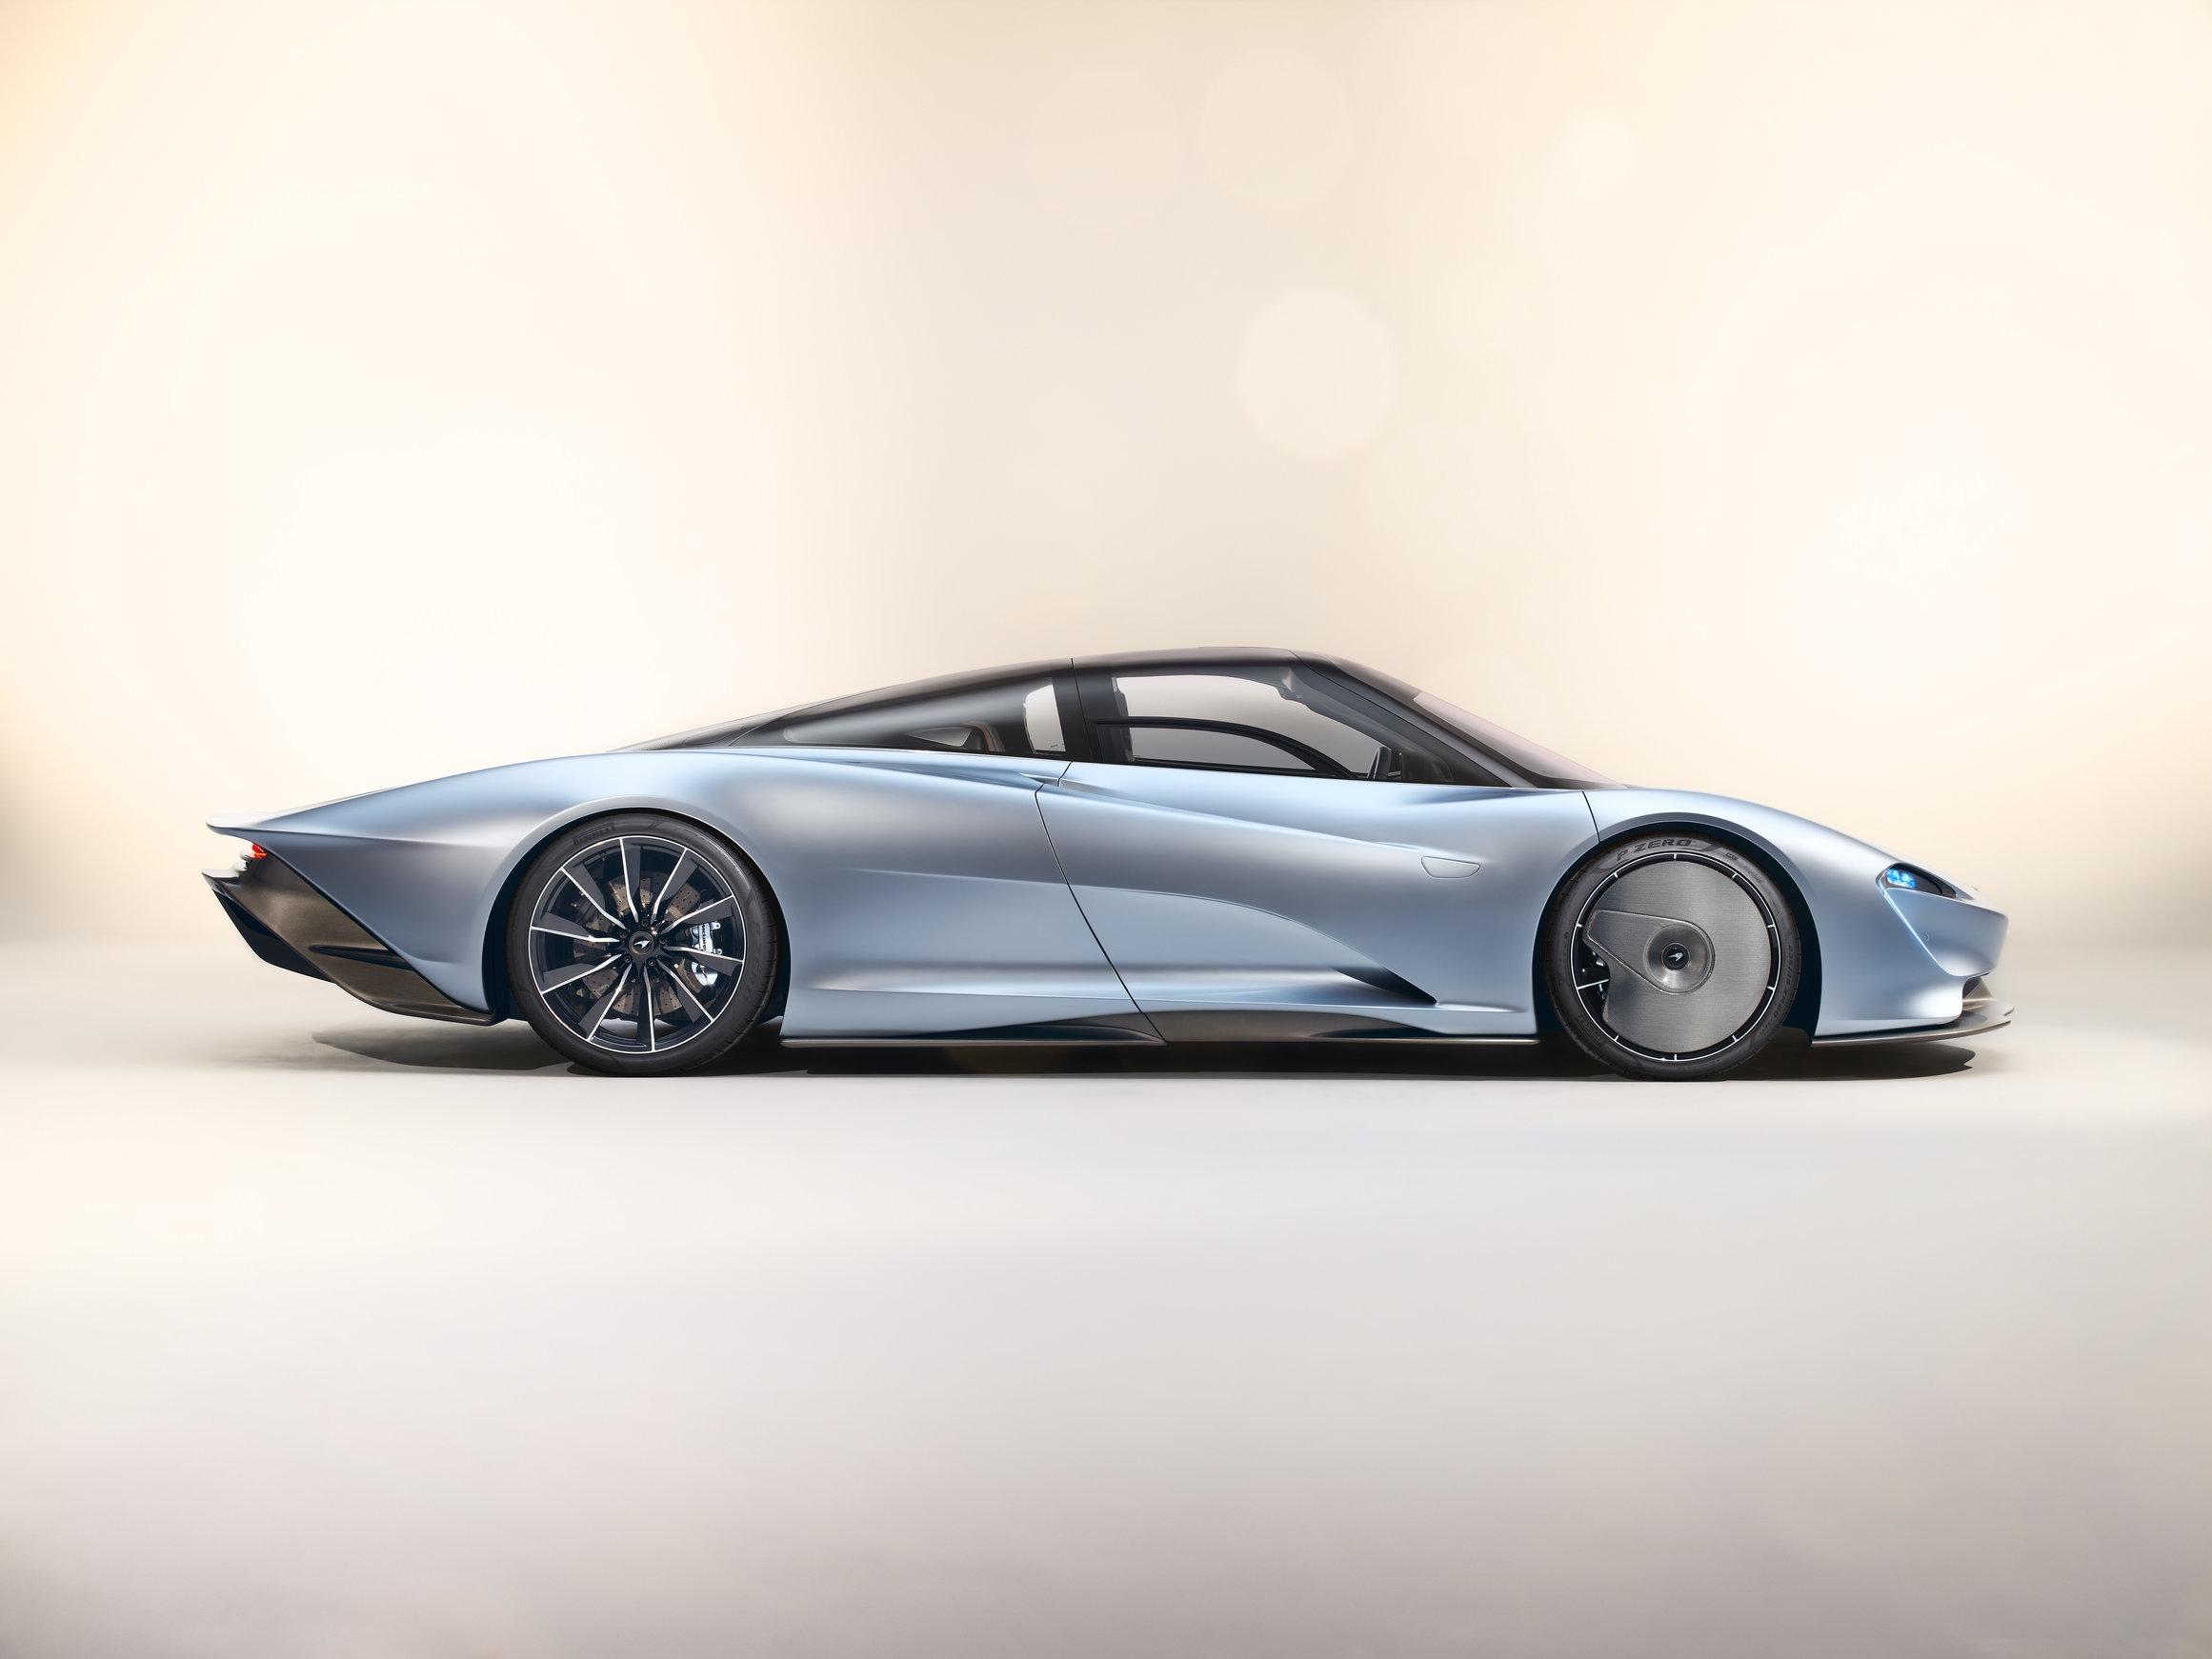 McLaren Speedtail Blows Past F1 with 250 MPH Top Speed